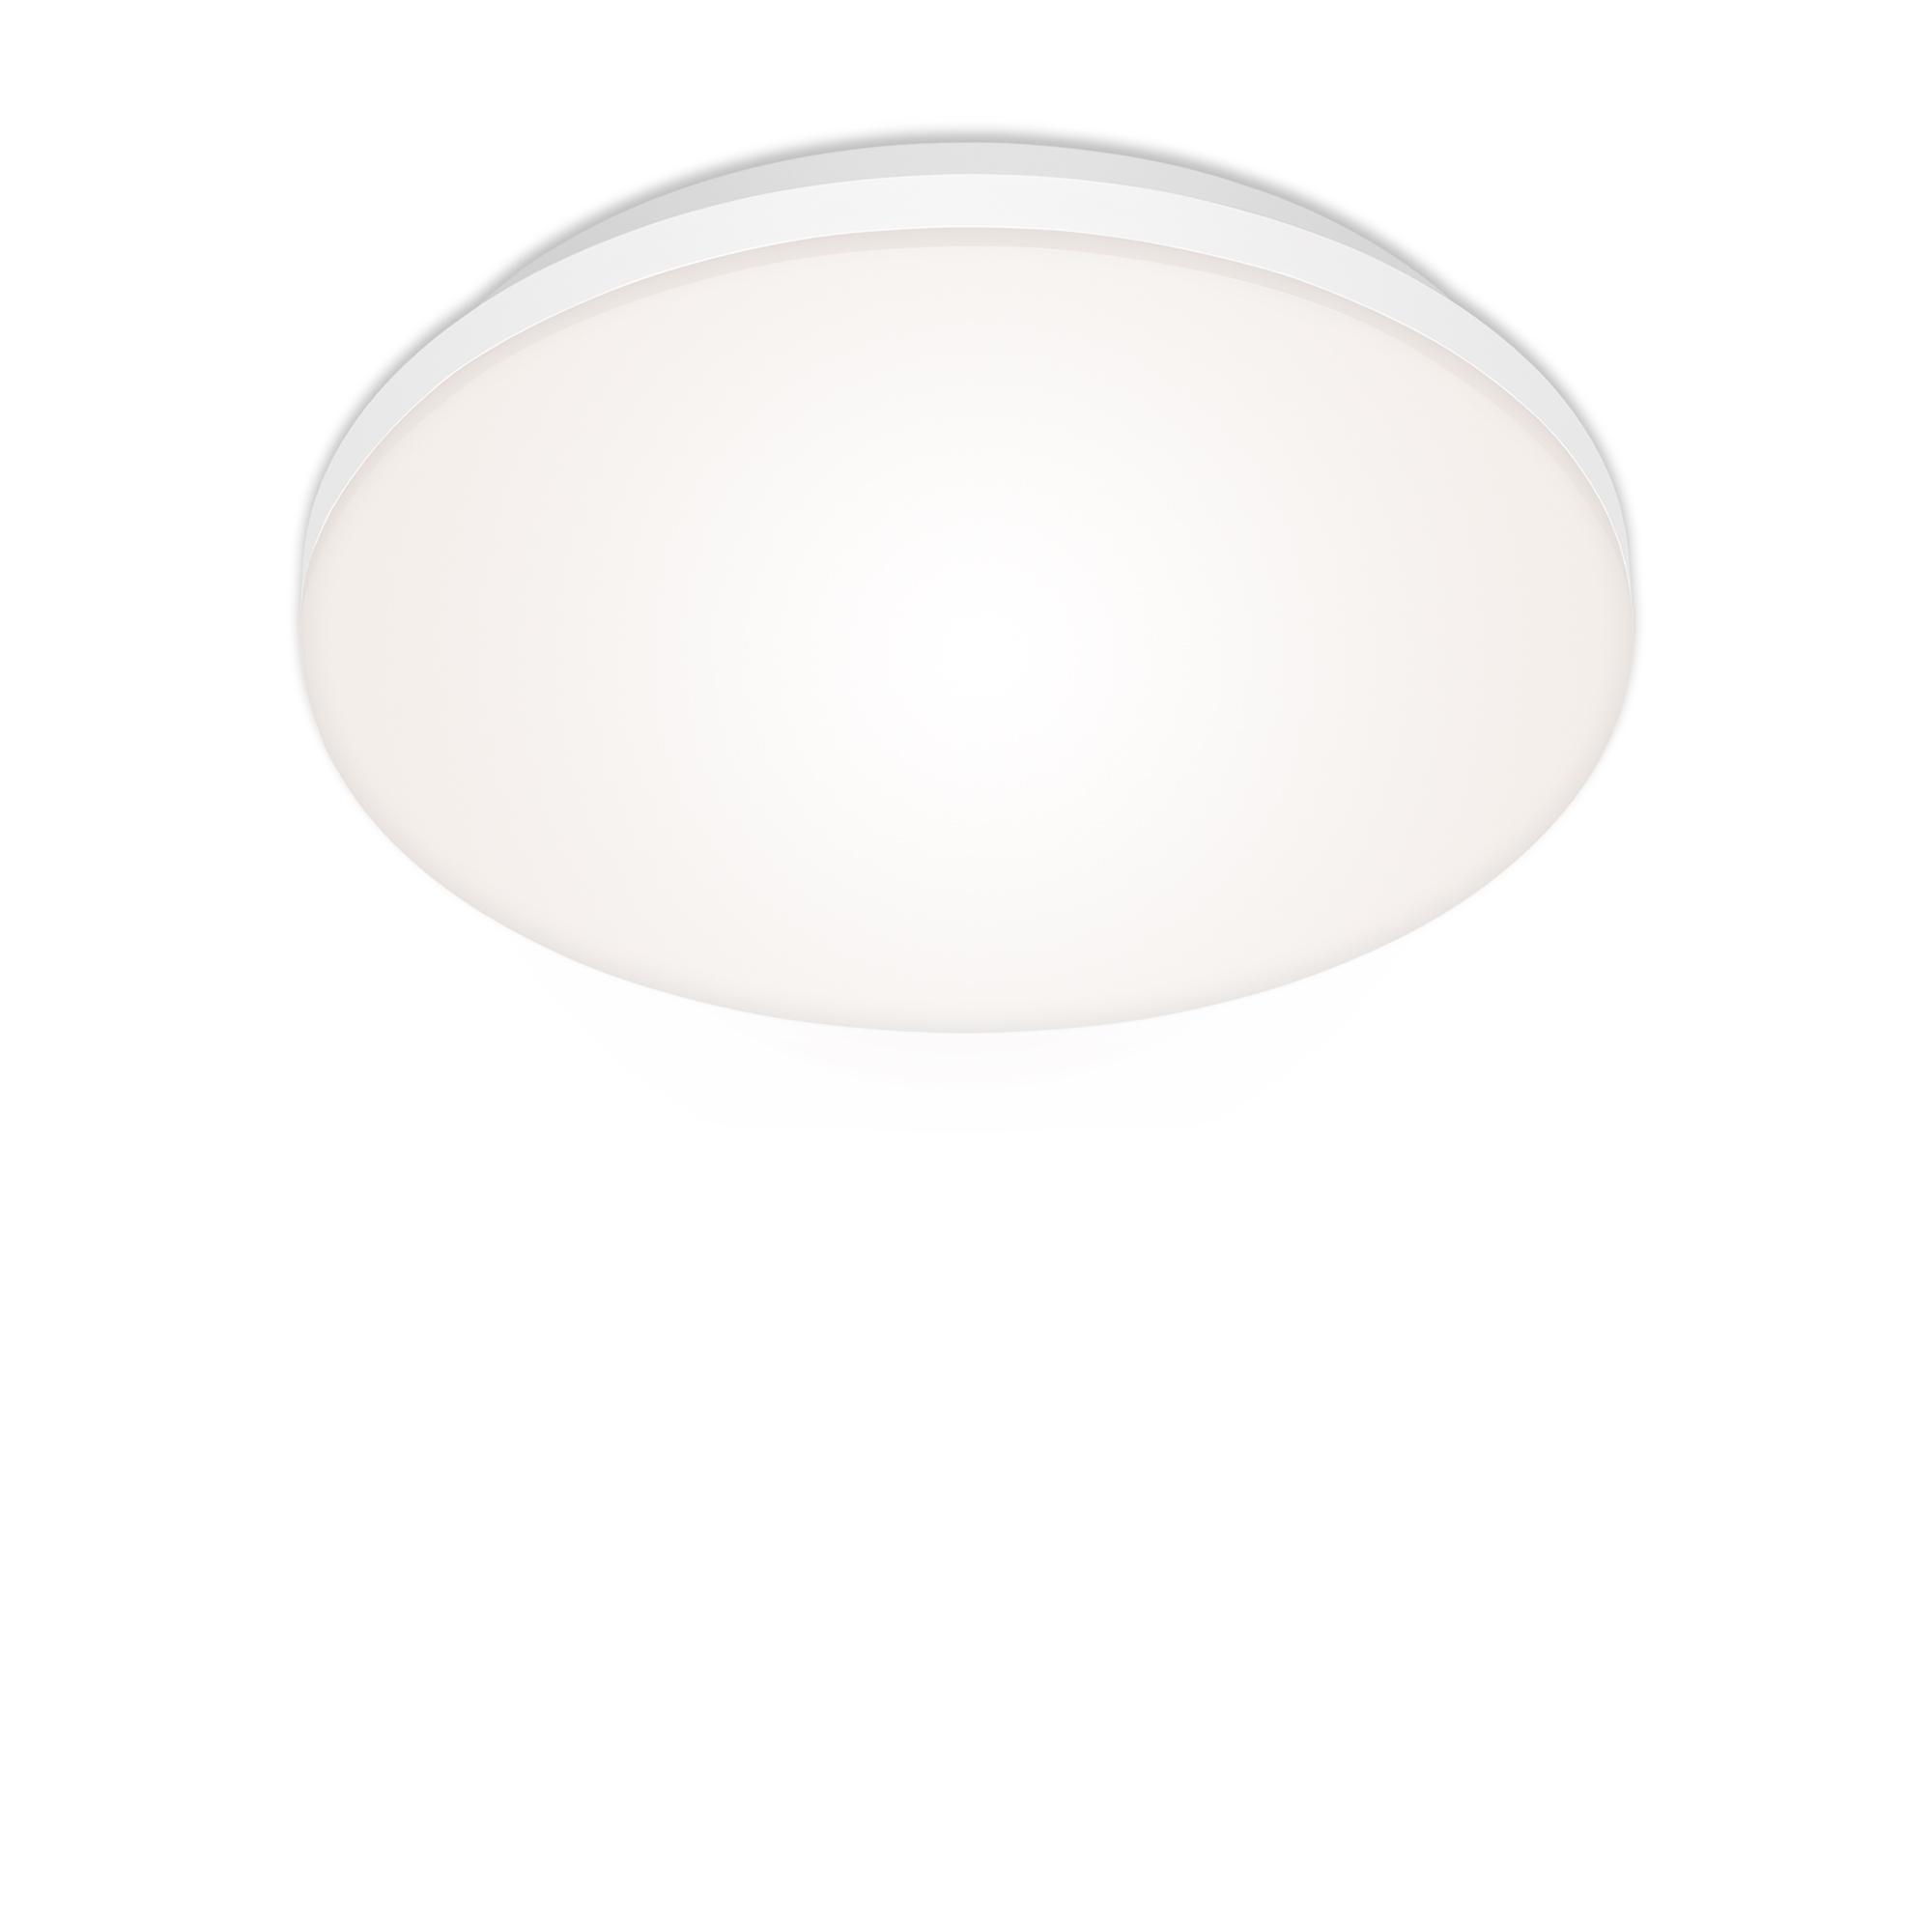 FRAMELESS LED Panel, Ø 30 cm, 1600 LUMEN, 12 WATT, Weiss